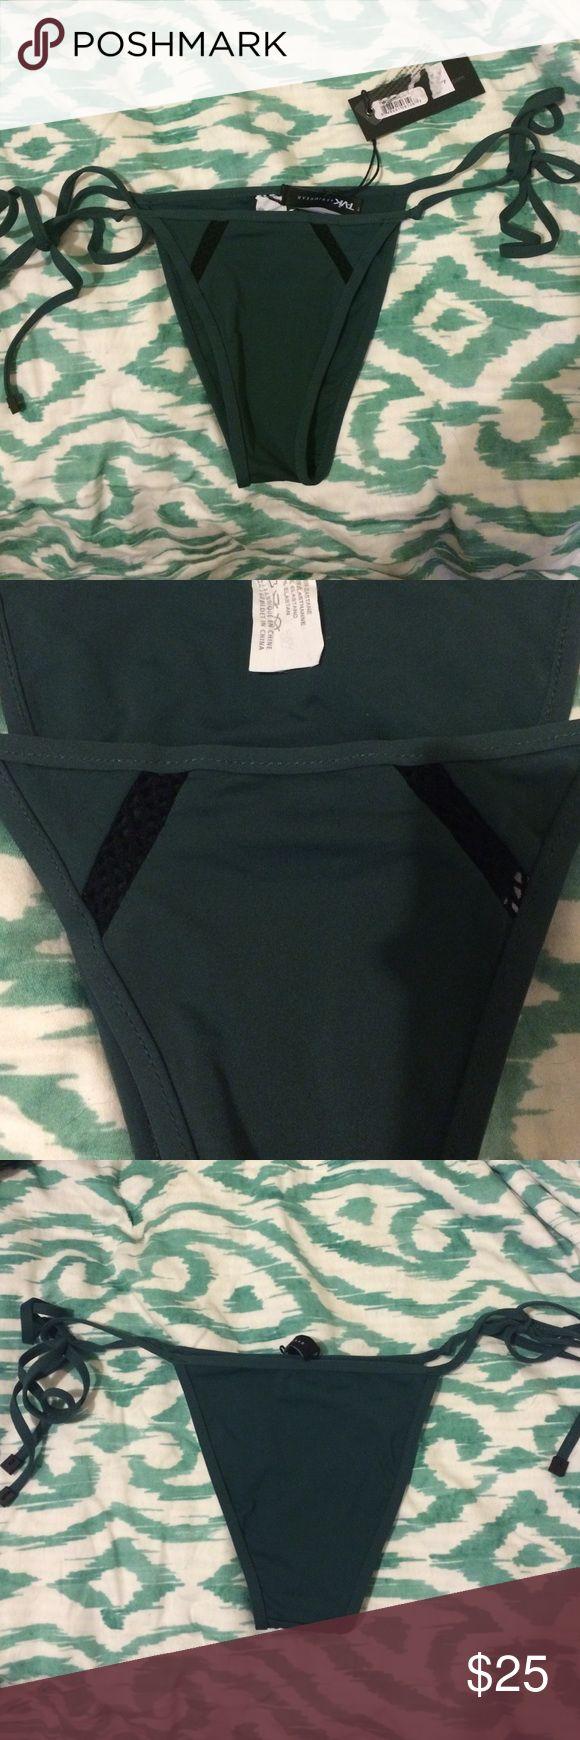 Tavik swimwear tie bottom in forest, xs Brand new with tags. Can fit a small, but will be skimpy. Tavik swimwear Swim Bikinis